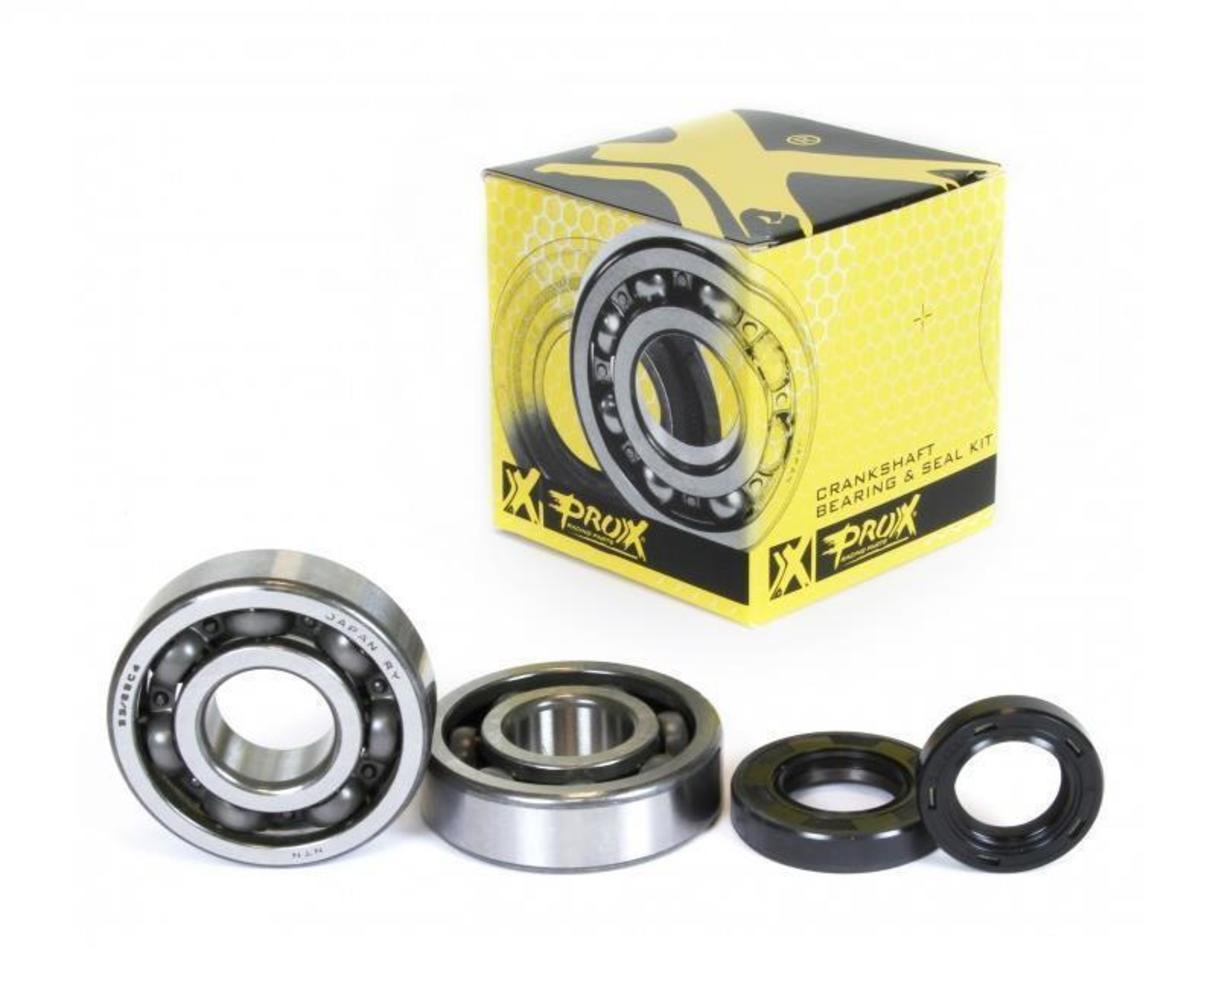 Pro-X Crankshaft Bearing and Seal Kit 23.CBS45088